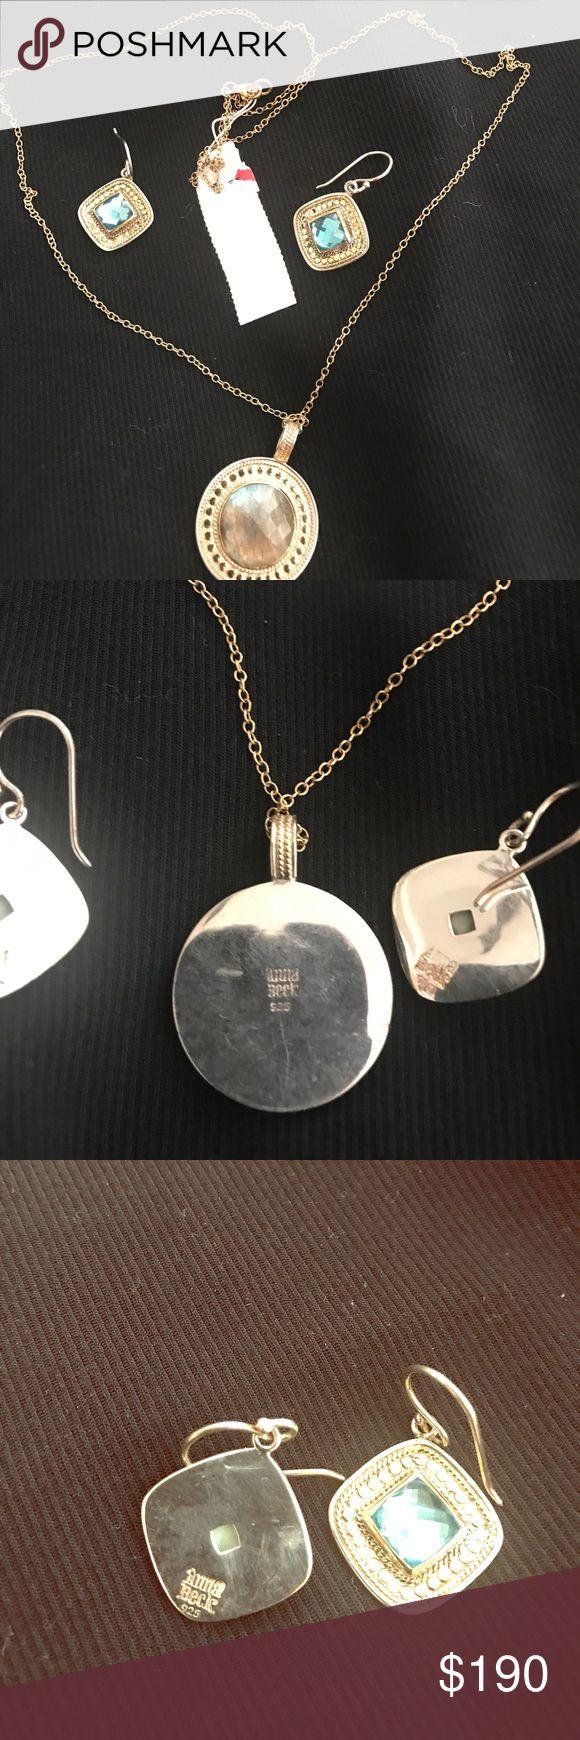 Anna beck necklace 925 silver Anna beck gray blue gold disc necklace labradorite stone anna beck Jewelry Necklaces